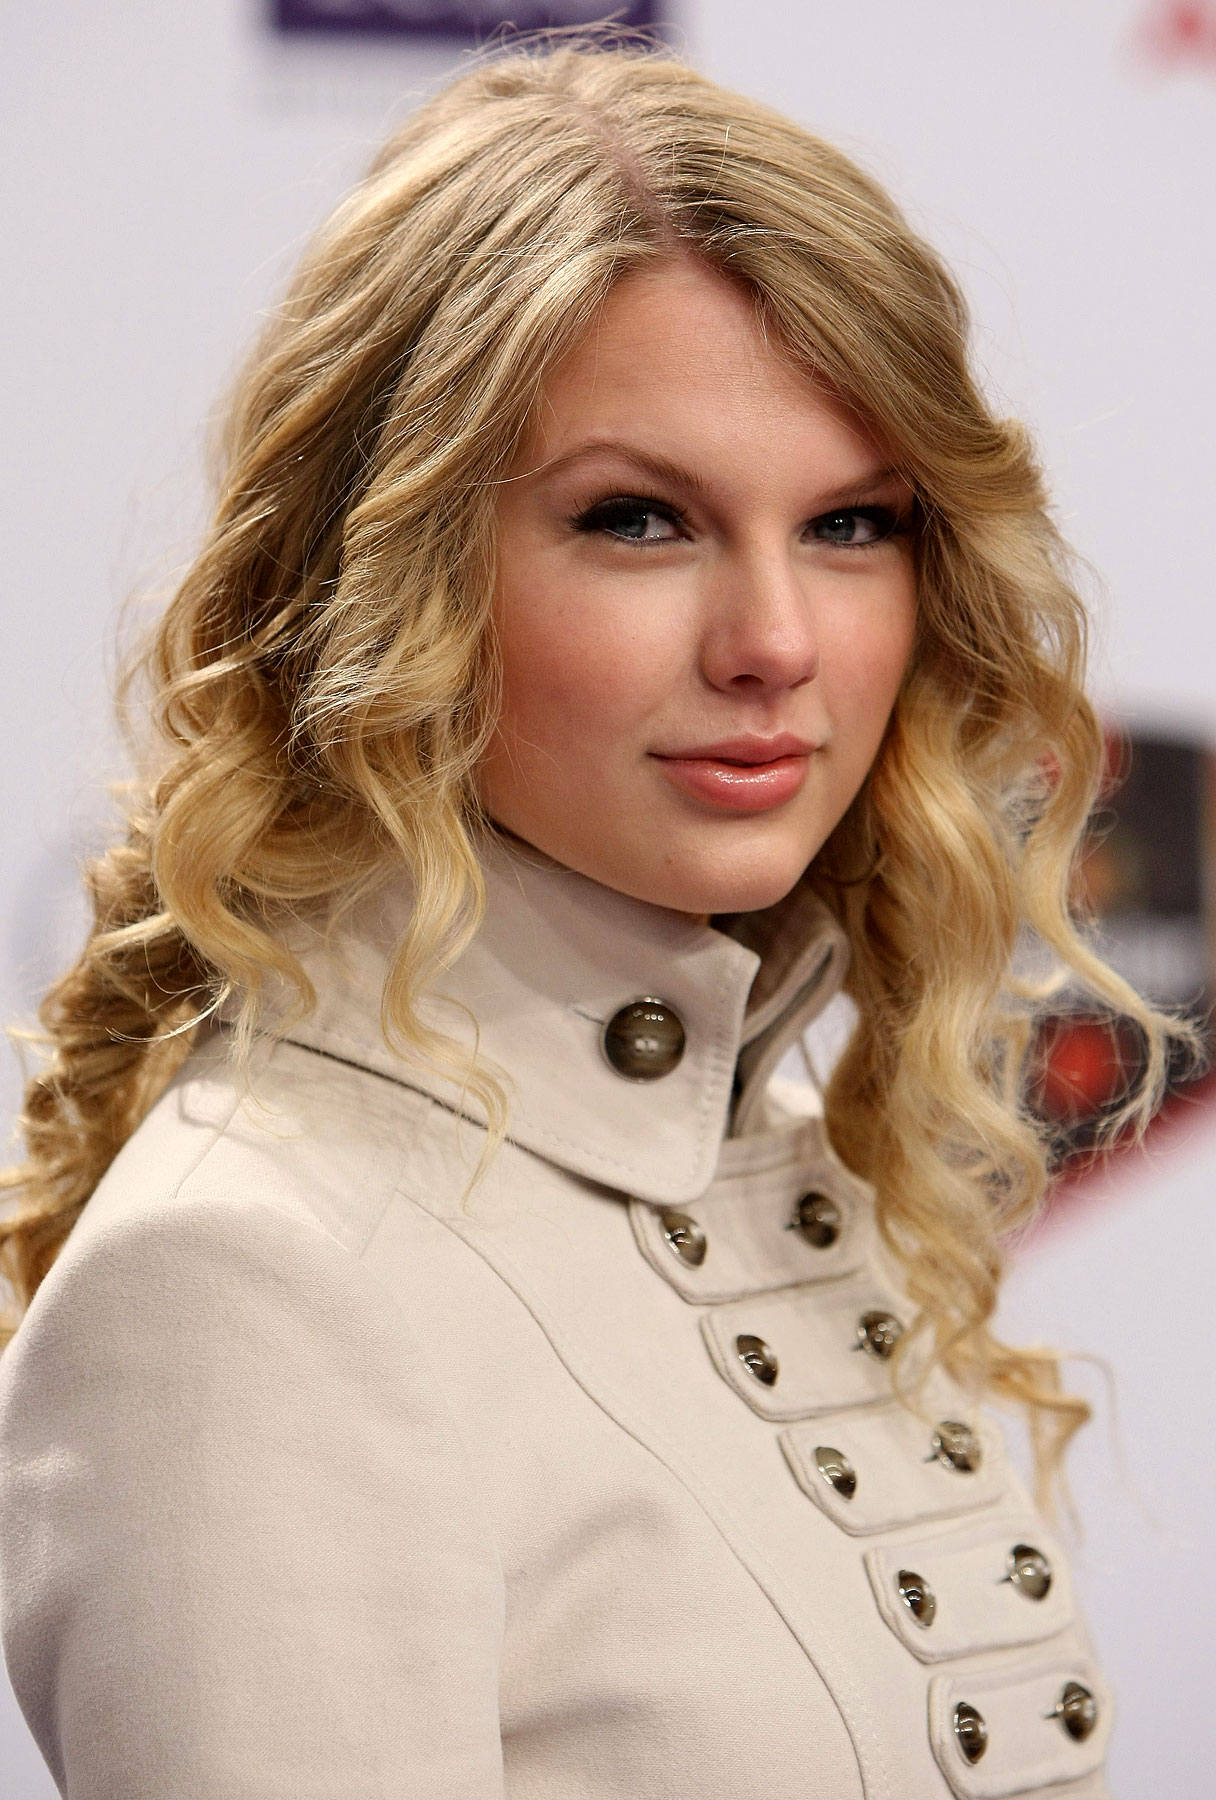 Taylor Swift's Death Wish Revealed!